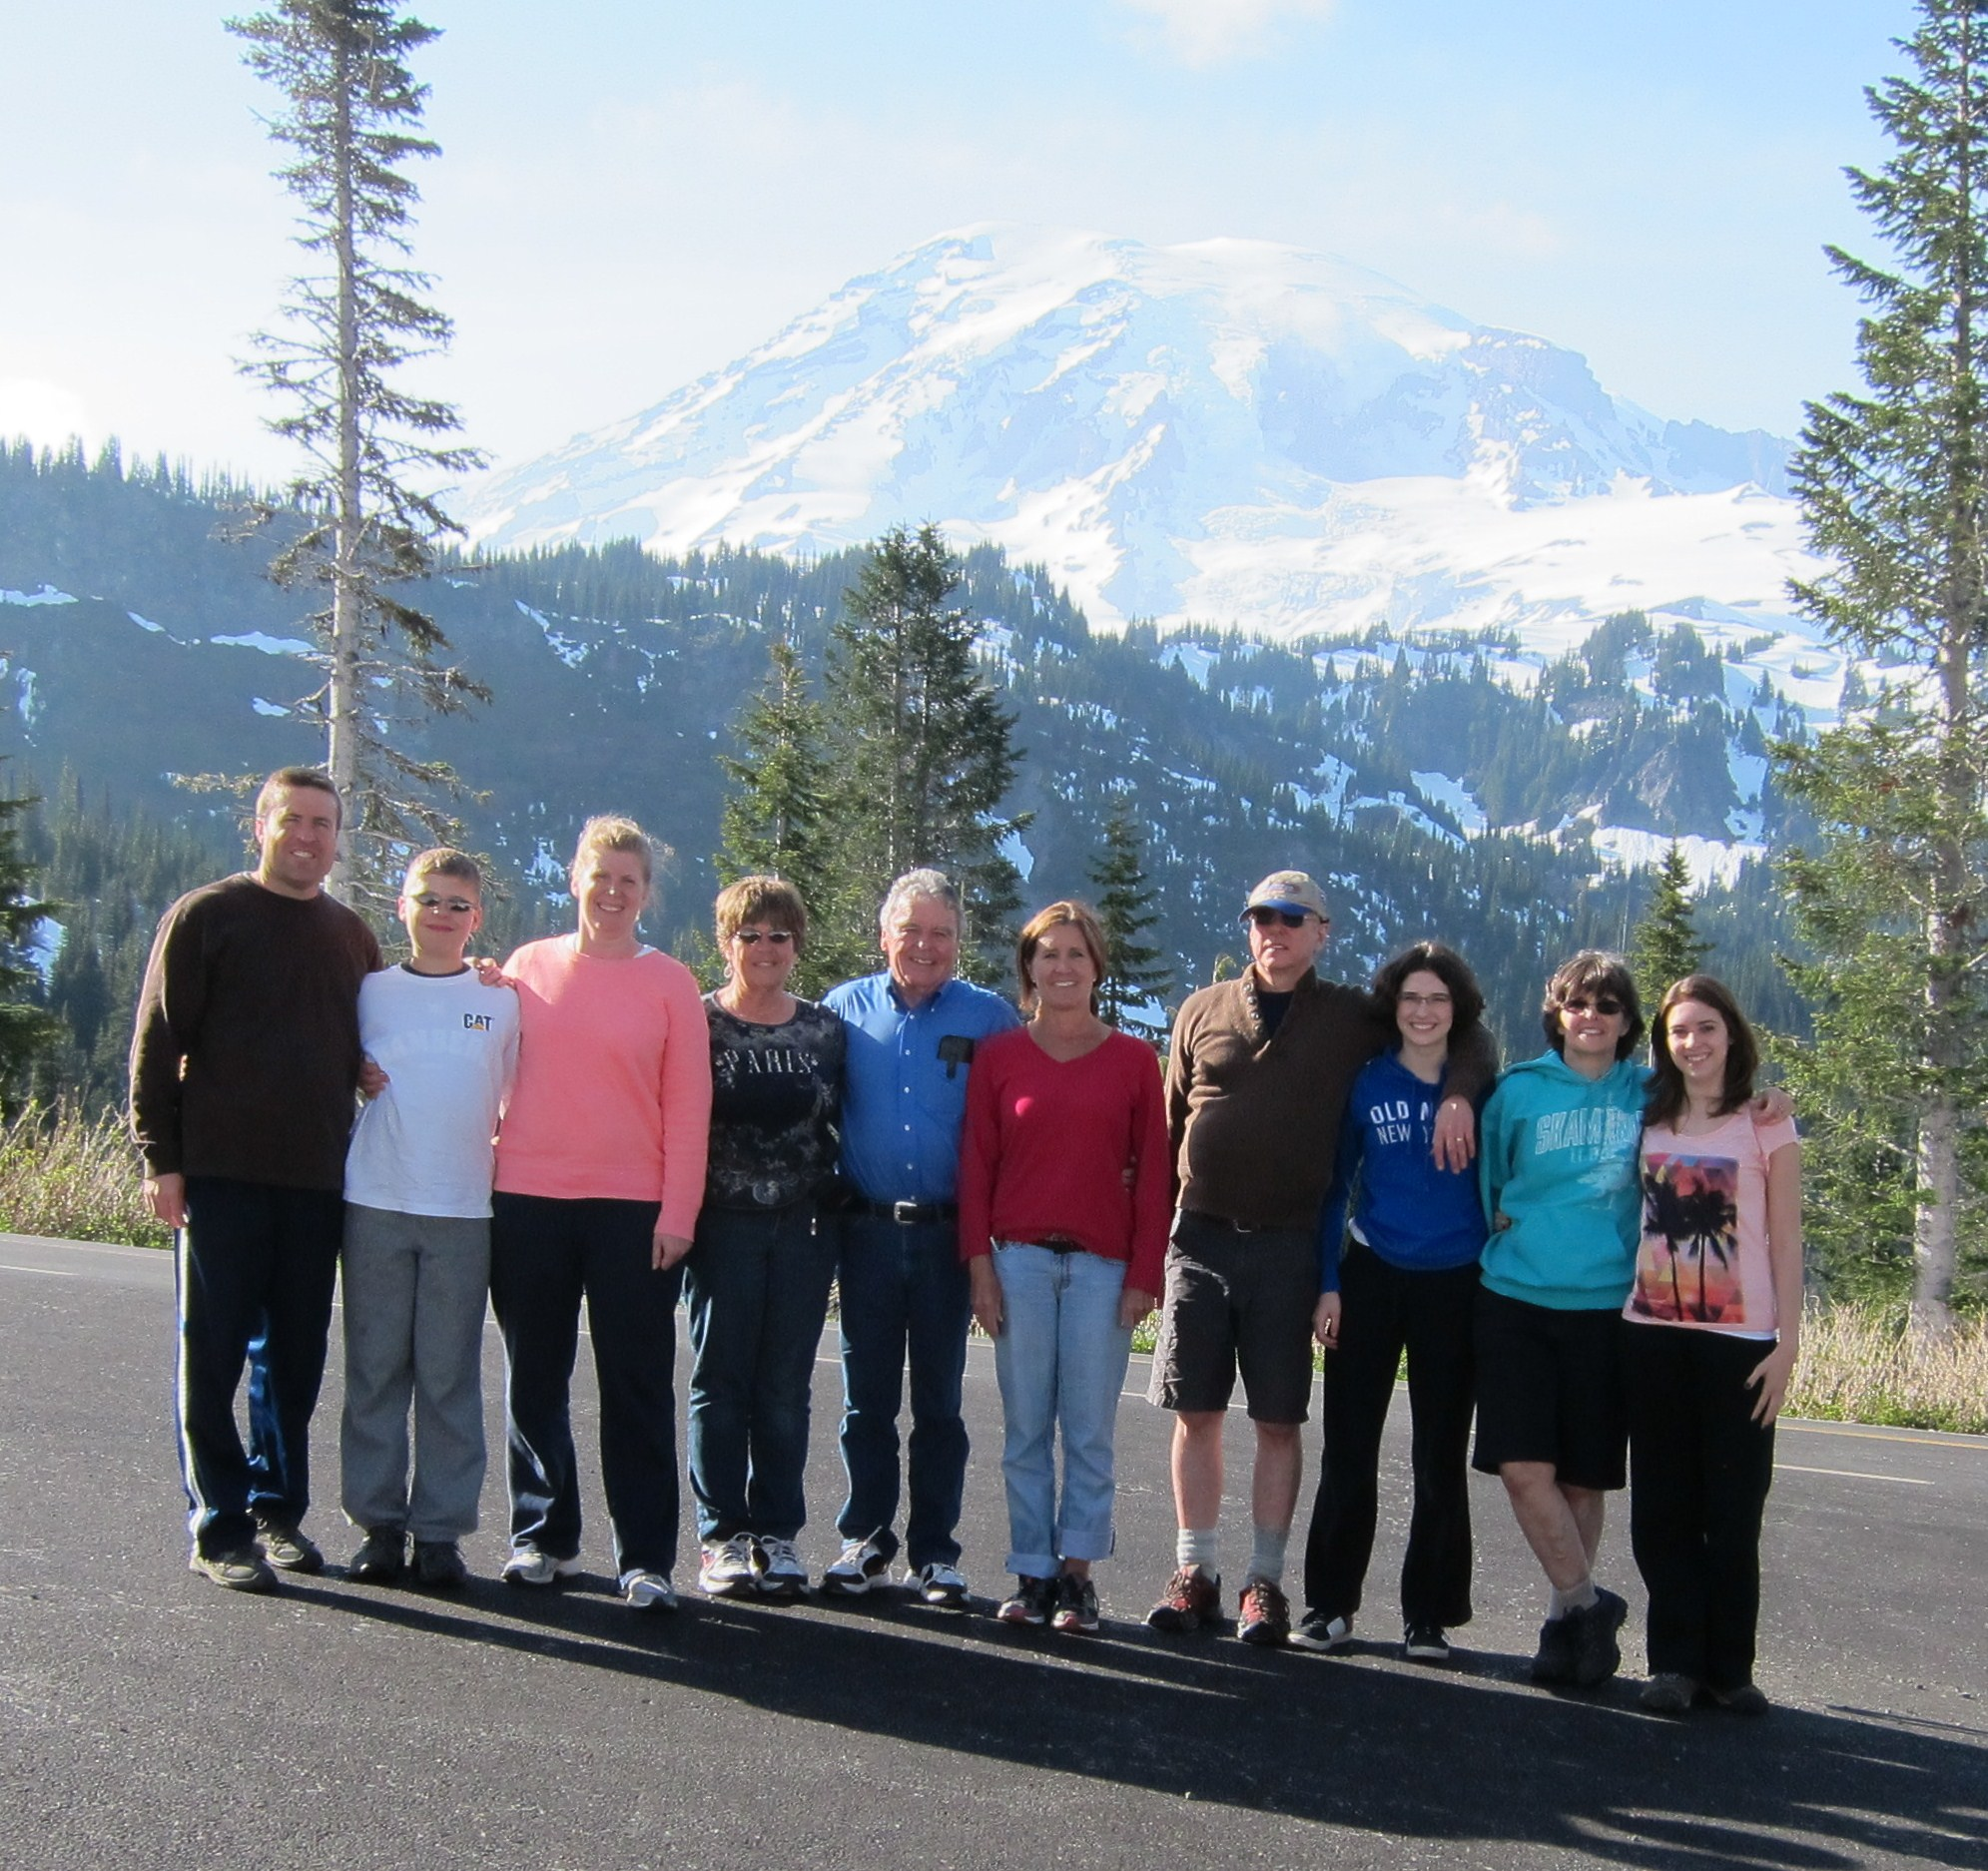 Our family at Mt. Rainier National Park